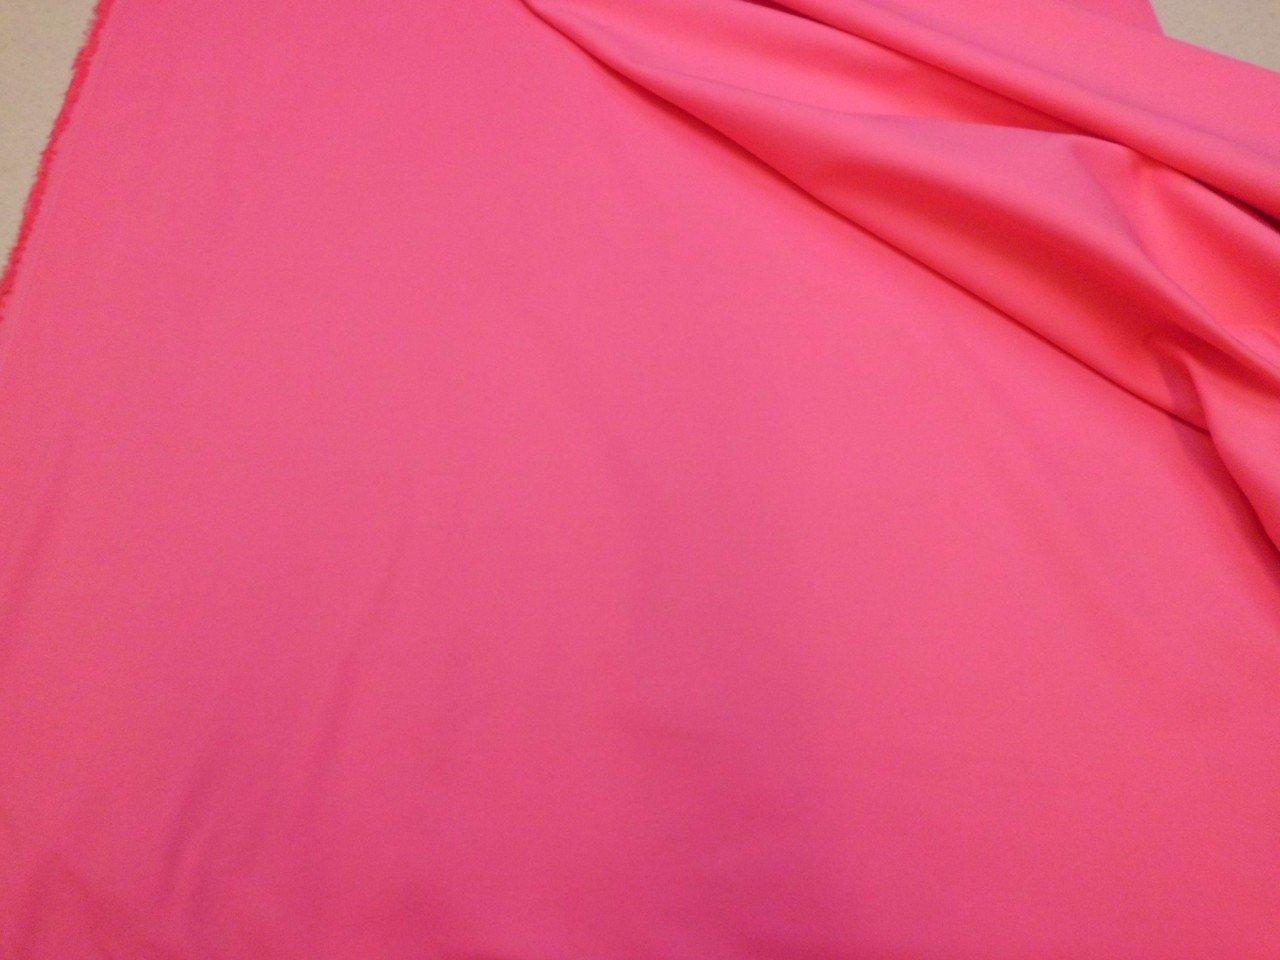 Double Weave Cotton, Nylon, & Spandex Woven